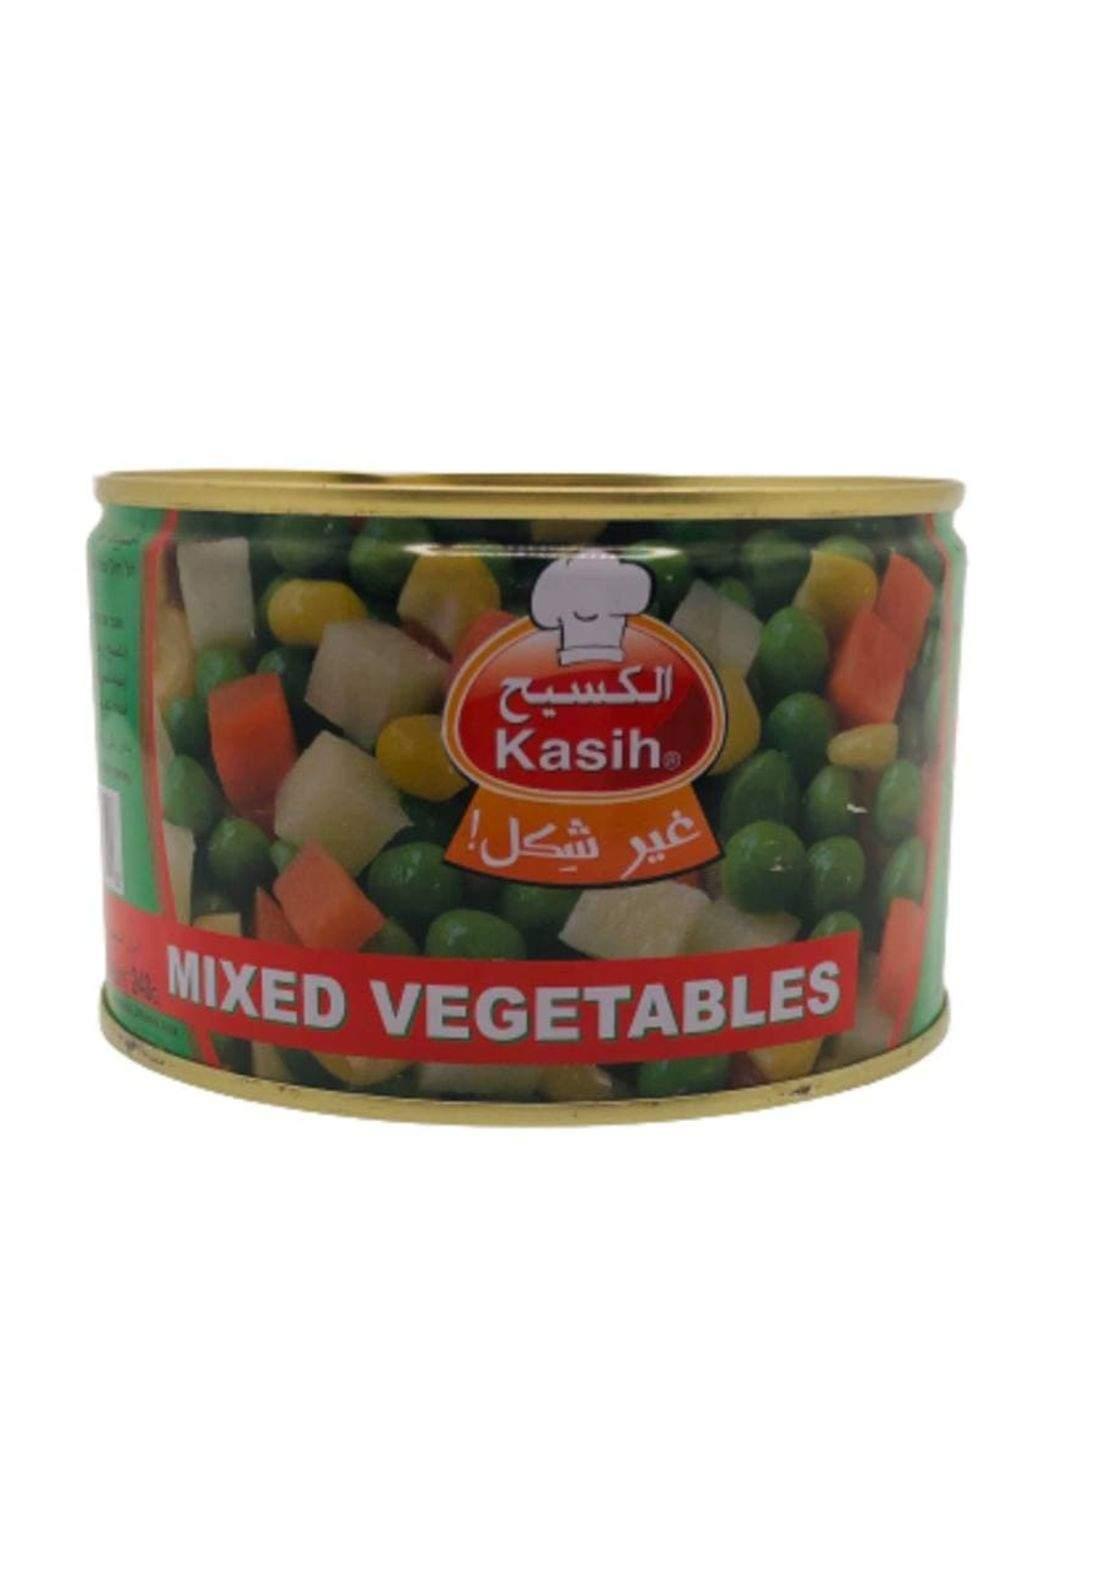 Kasih mixed vegetables 400g الكسيح خضار مشكل